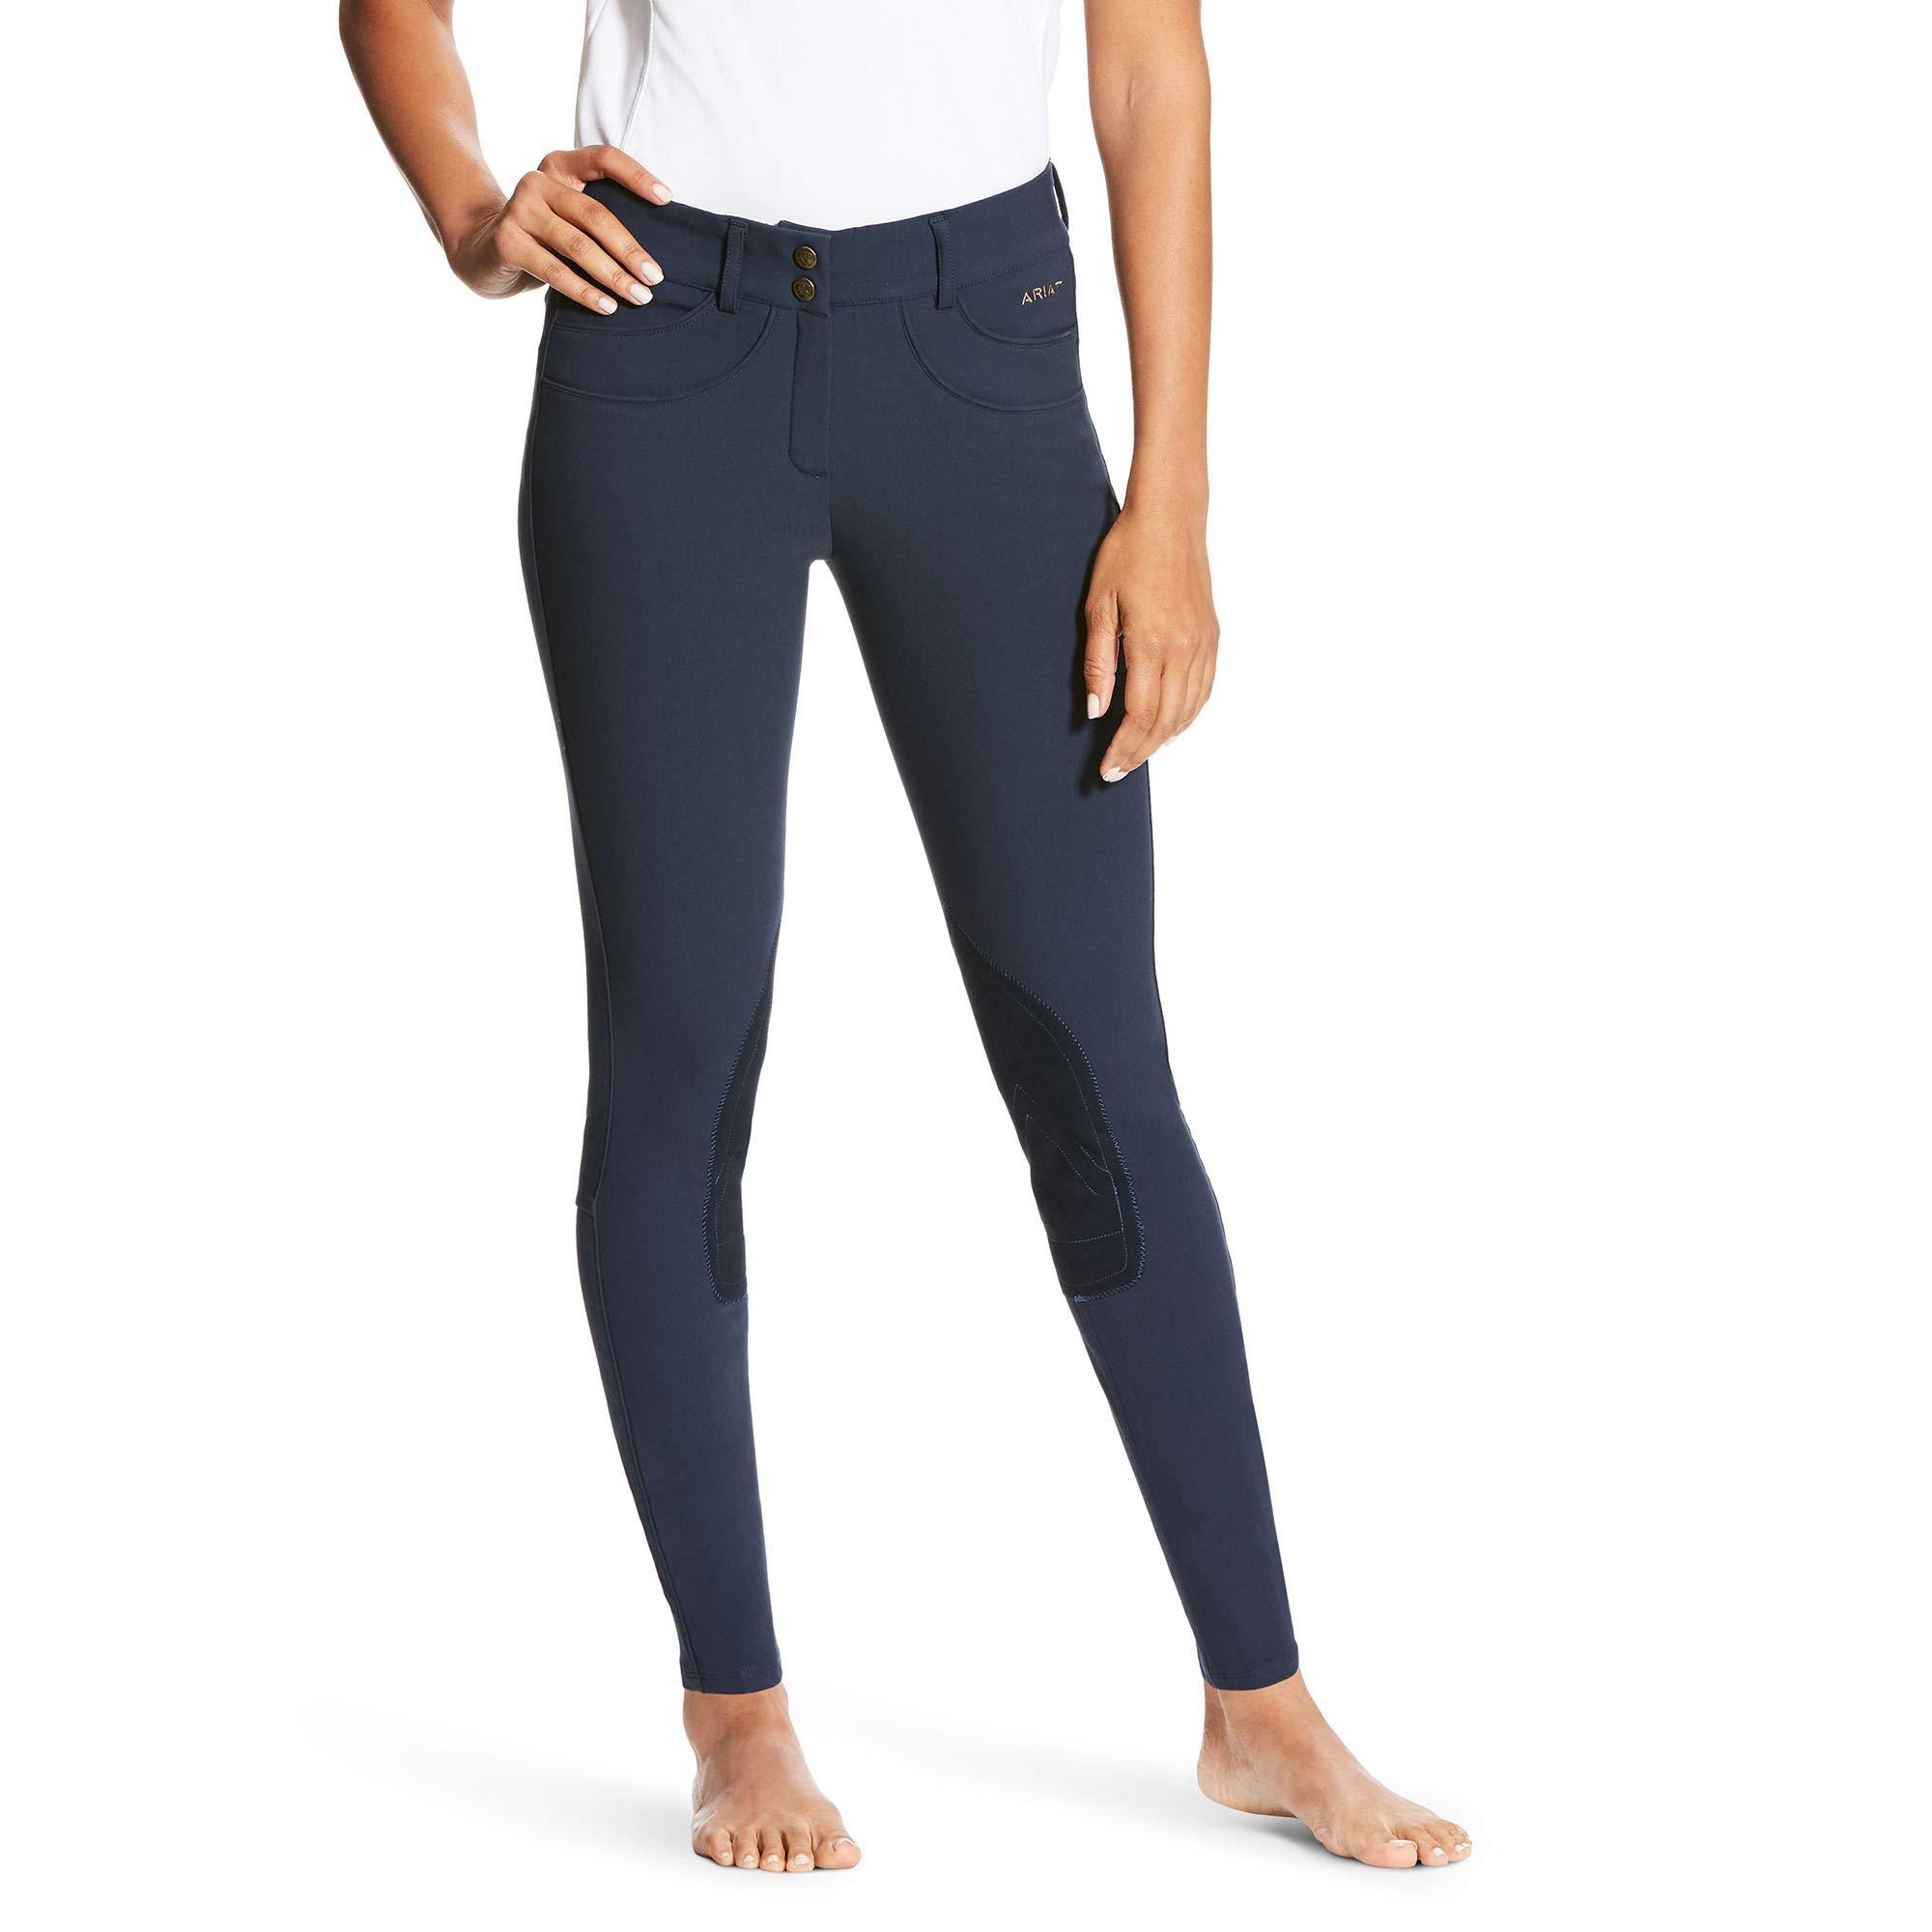 ARIAT Women's Olympia Low Rise Knee Patch Front Zip Knee Patch Breech Navy Size 24 Regular